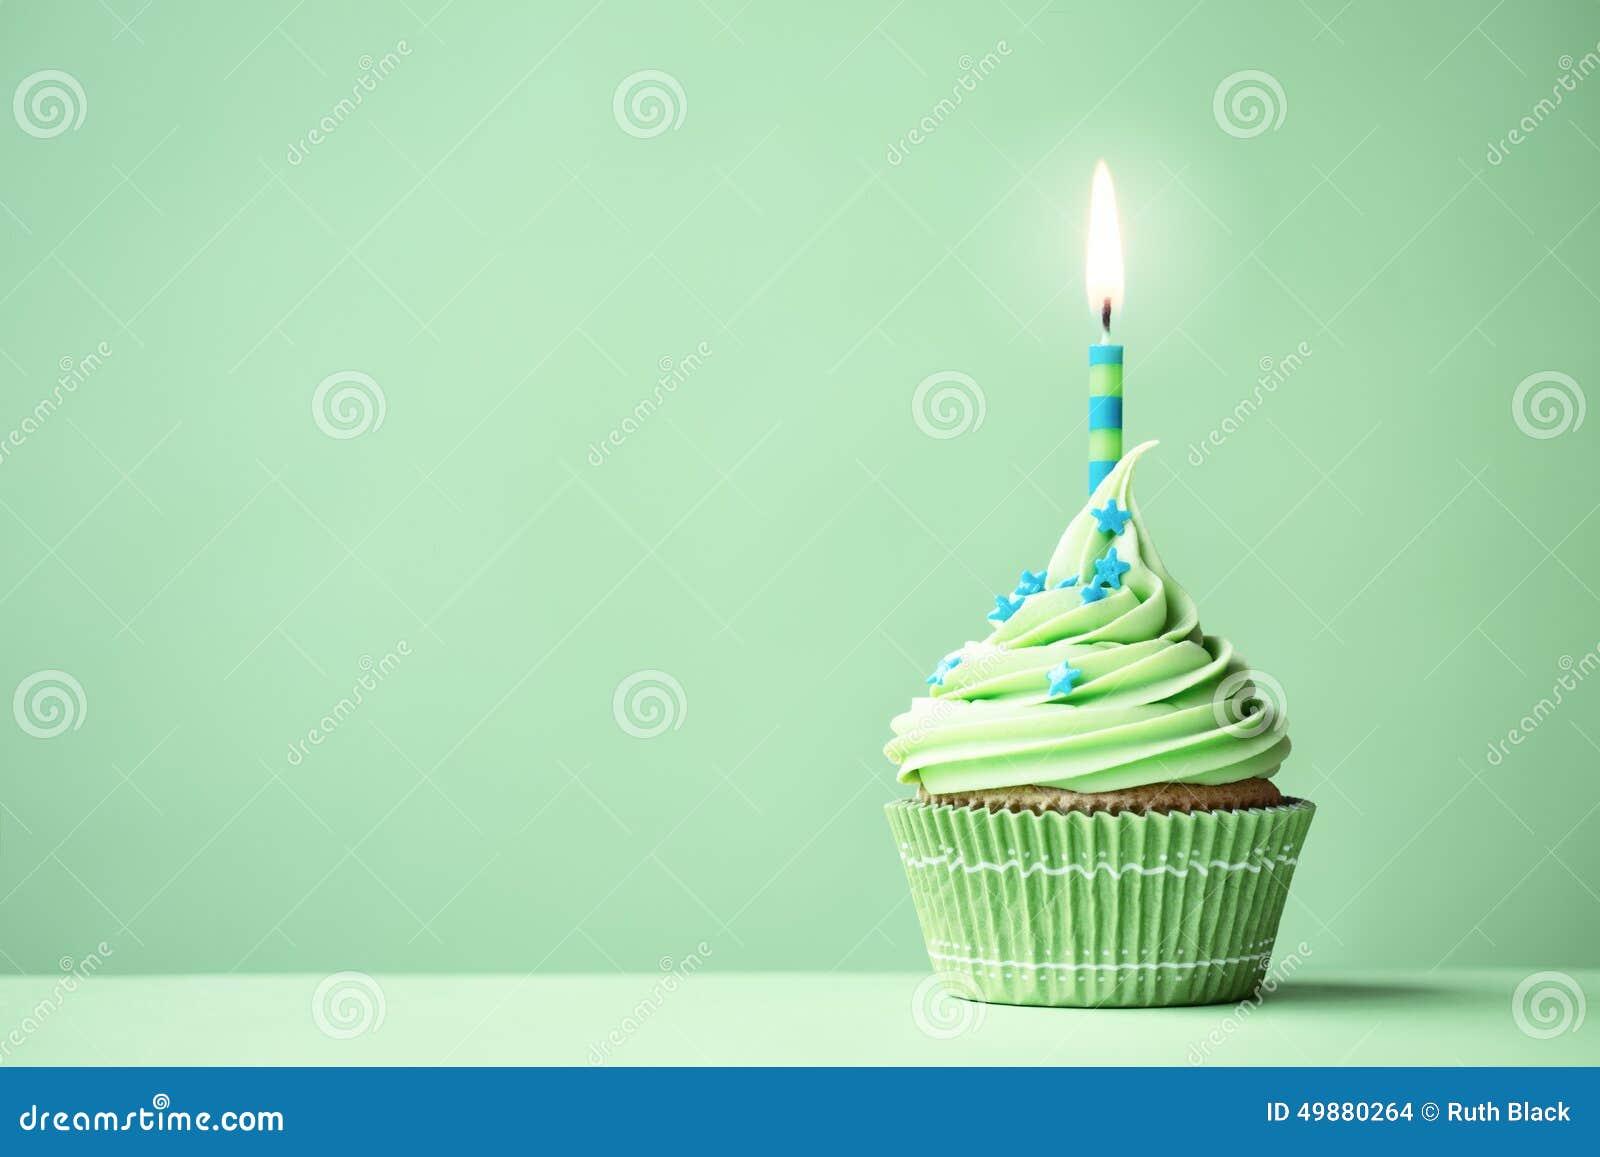 Green Birthday Cupcake Stock Photo - Image: 49880264